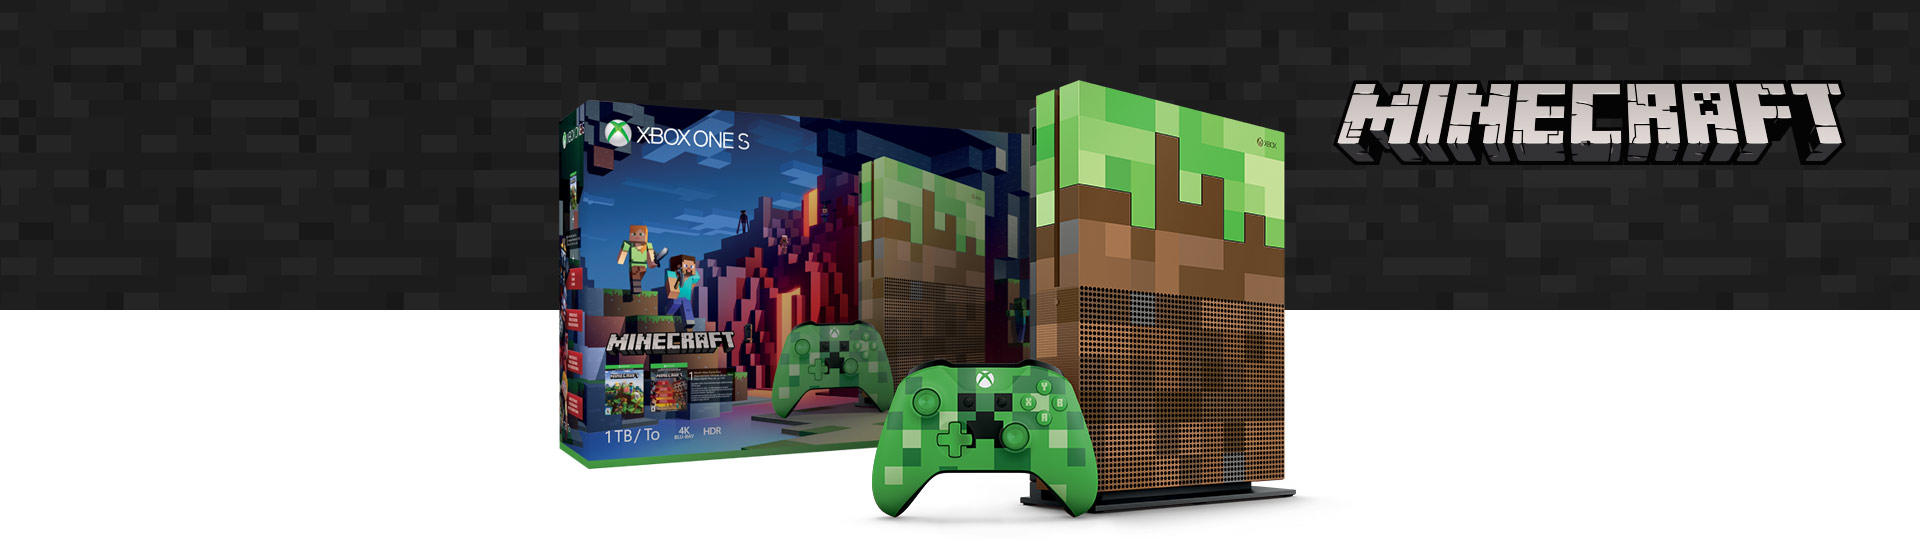 Xbox One S Minecraft Limited Edition Bundle (1TB)